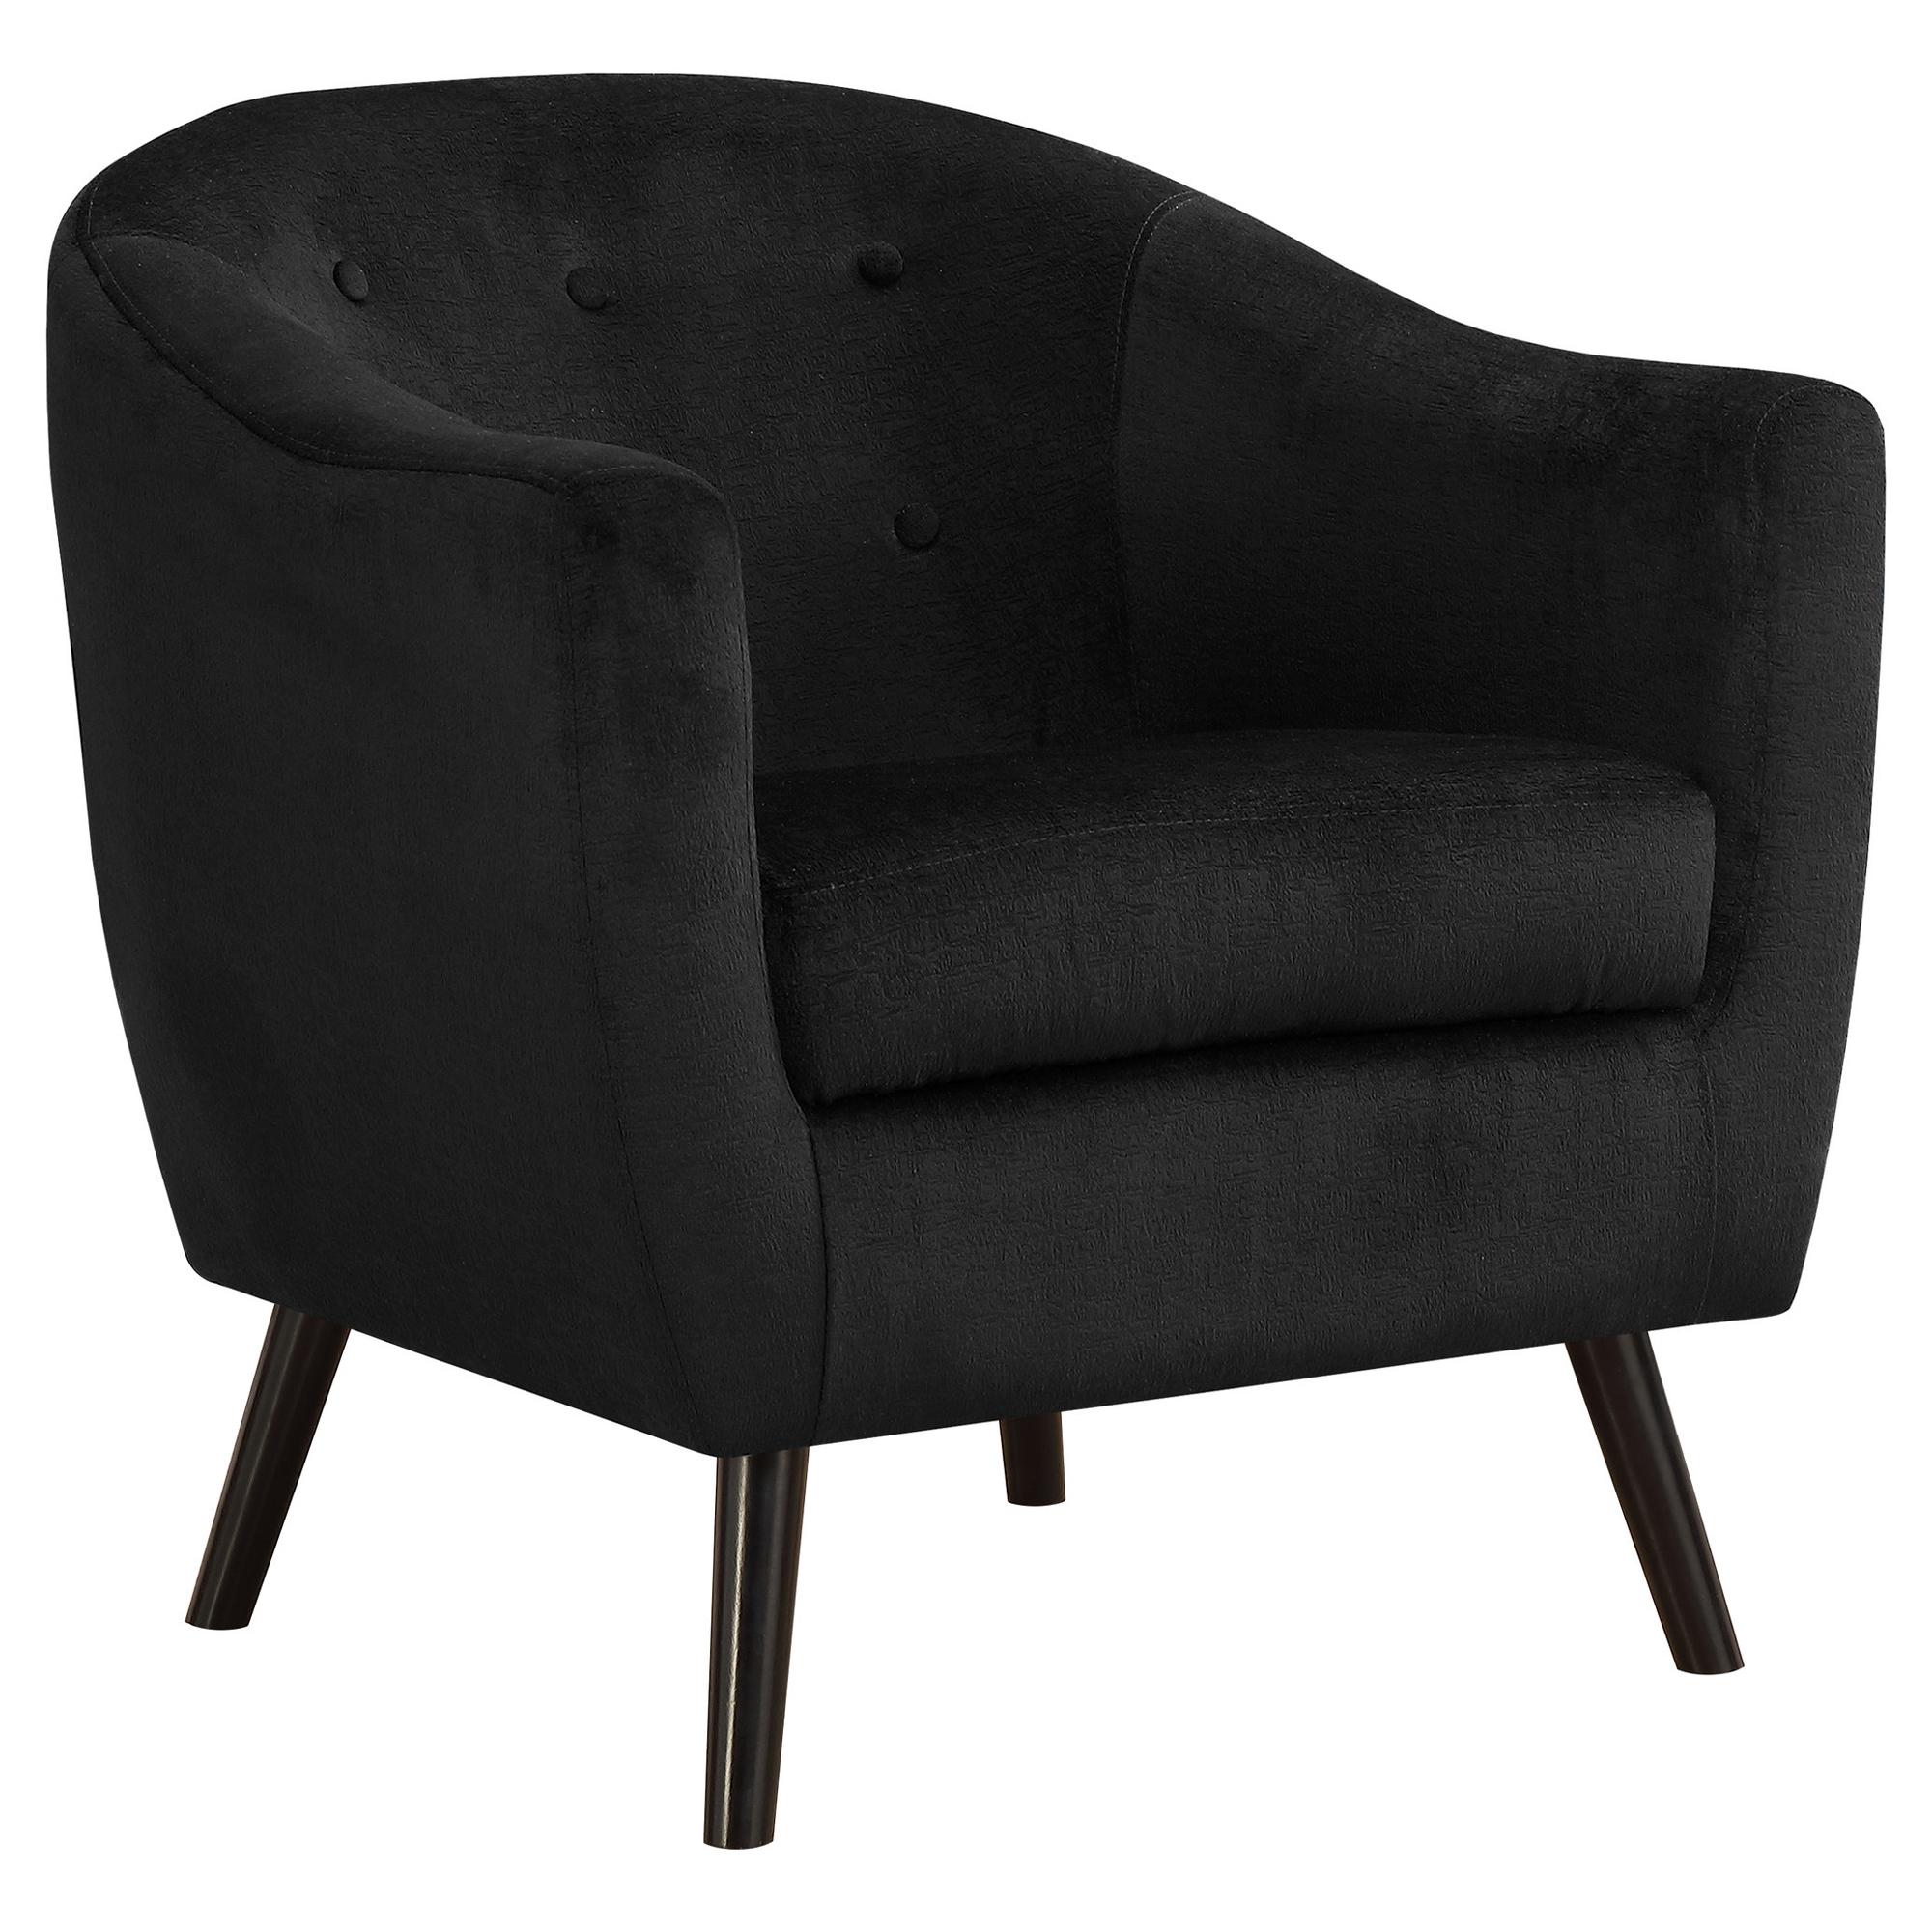 Brilliant Accent Chair Black Mosaic Velvet Bralicious Painted Fabric Chair Ideas Braliciousco